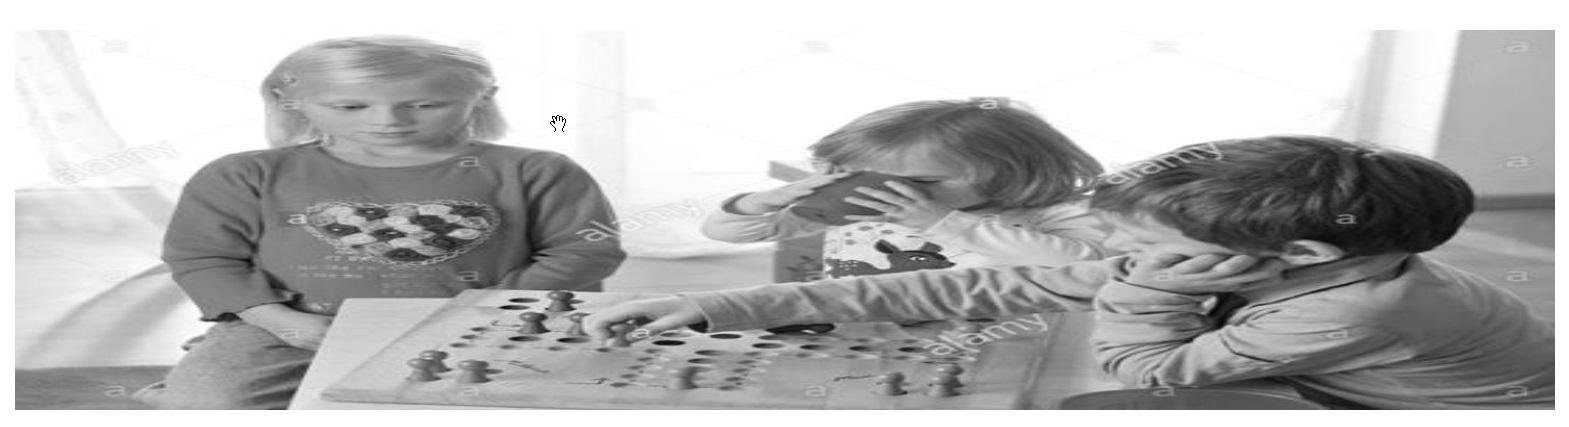 Sherlin and Danju are Playing Ludo - Teachoo.jpg